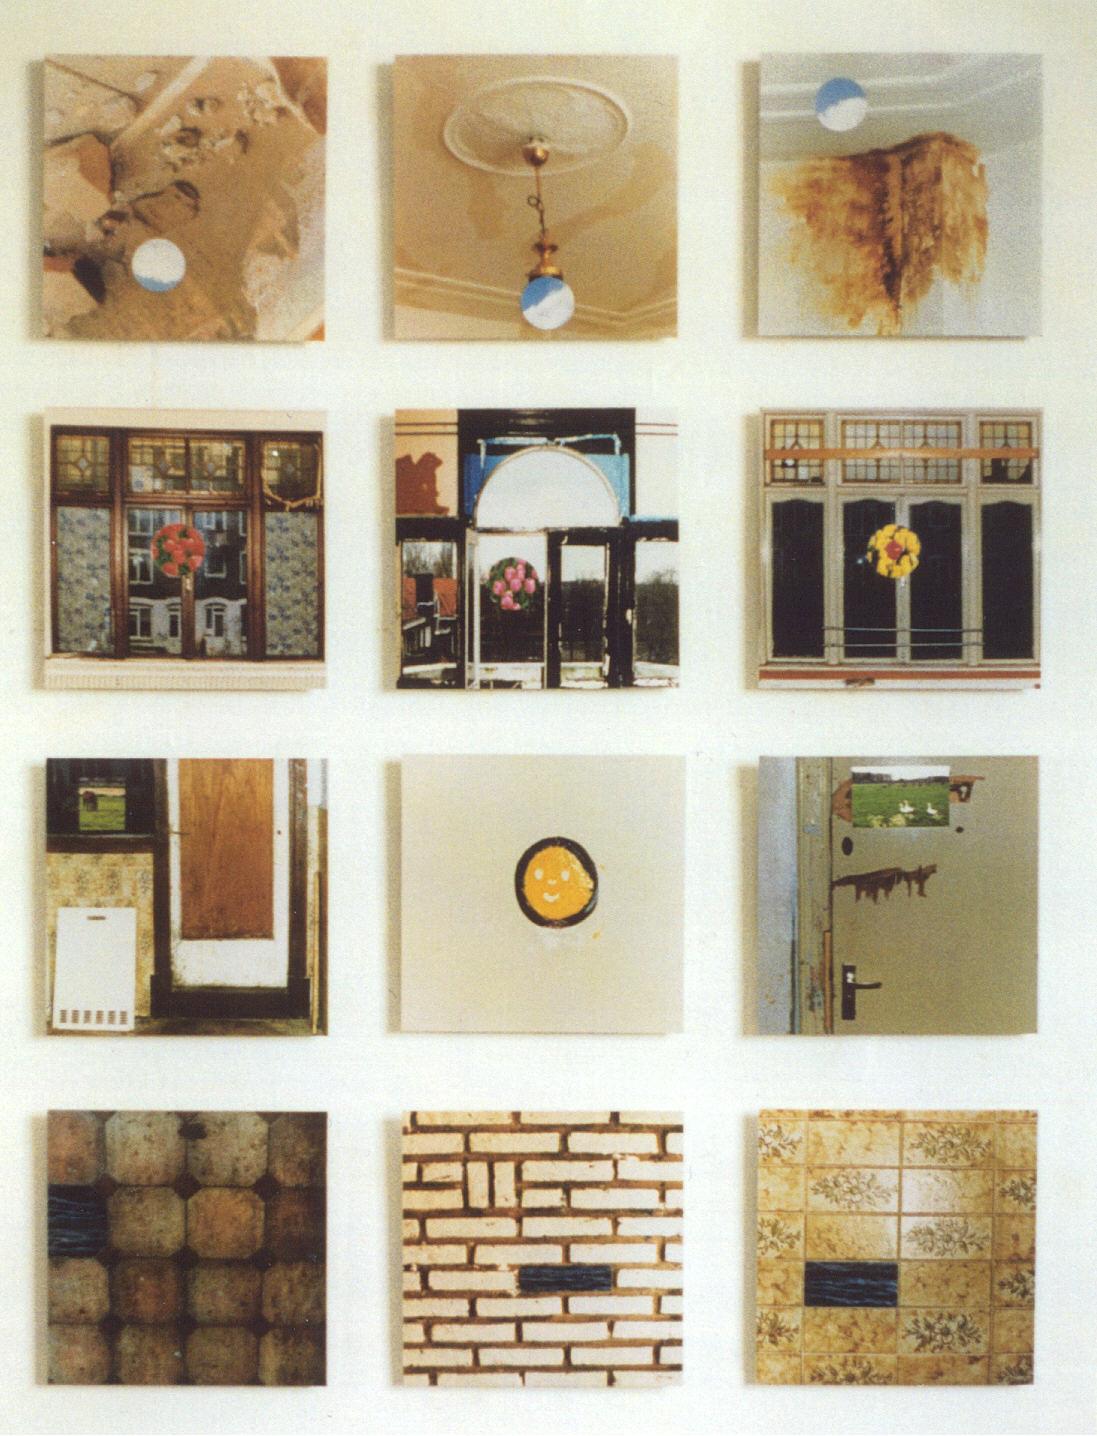 1999-Fotowerk, projectbureau medelanders ,R'dam, 100x70cm